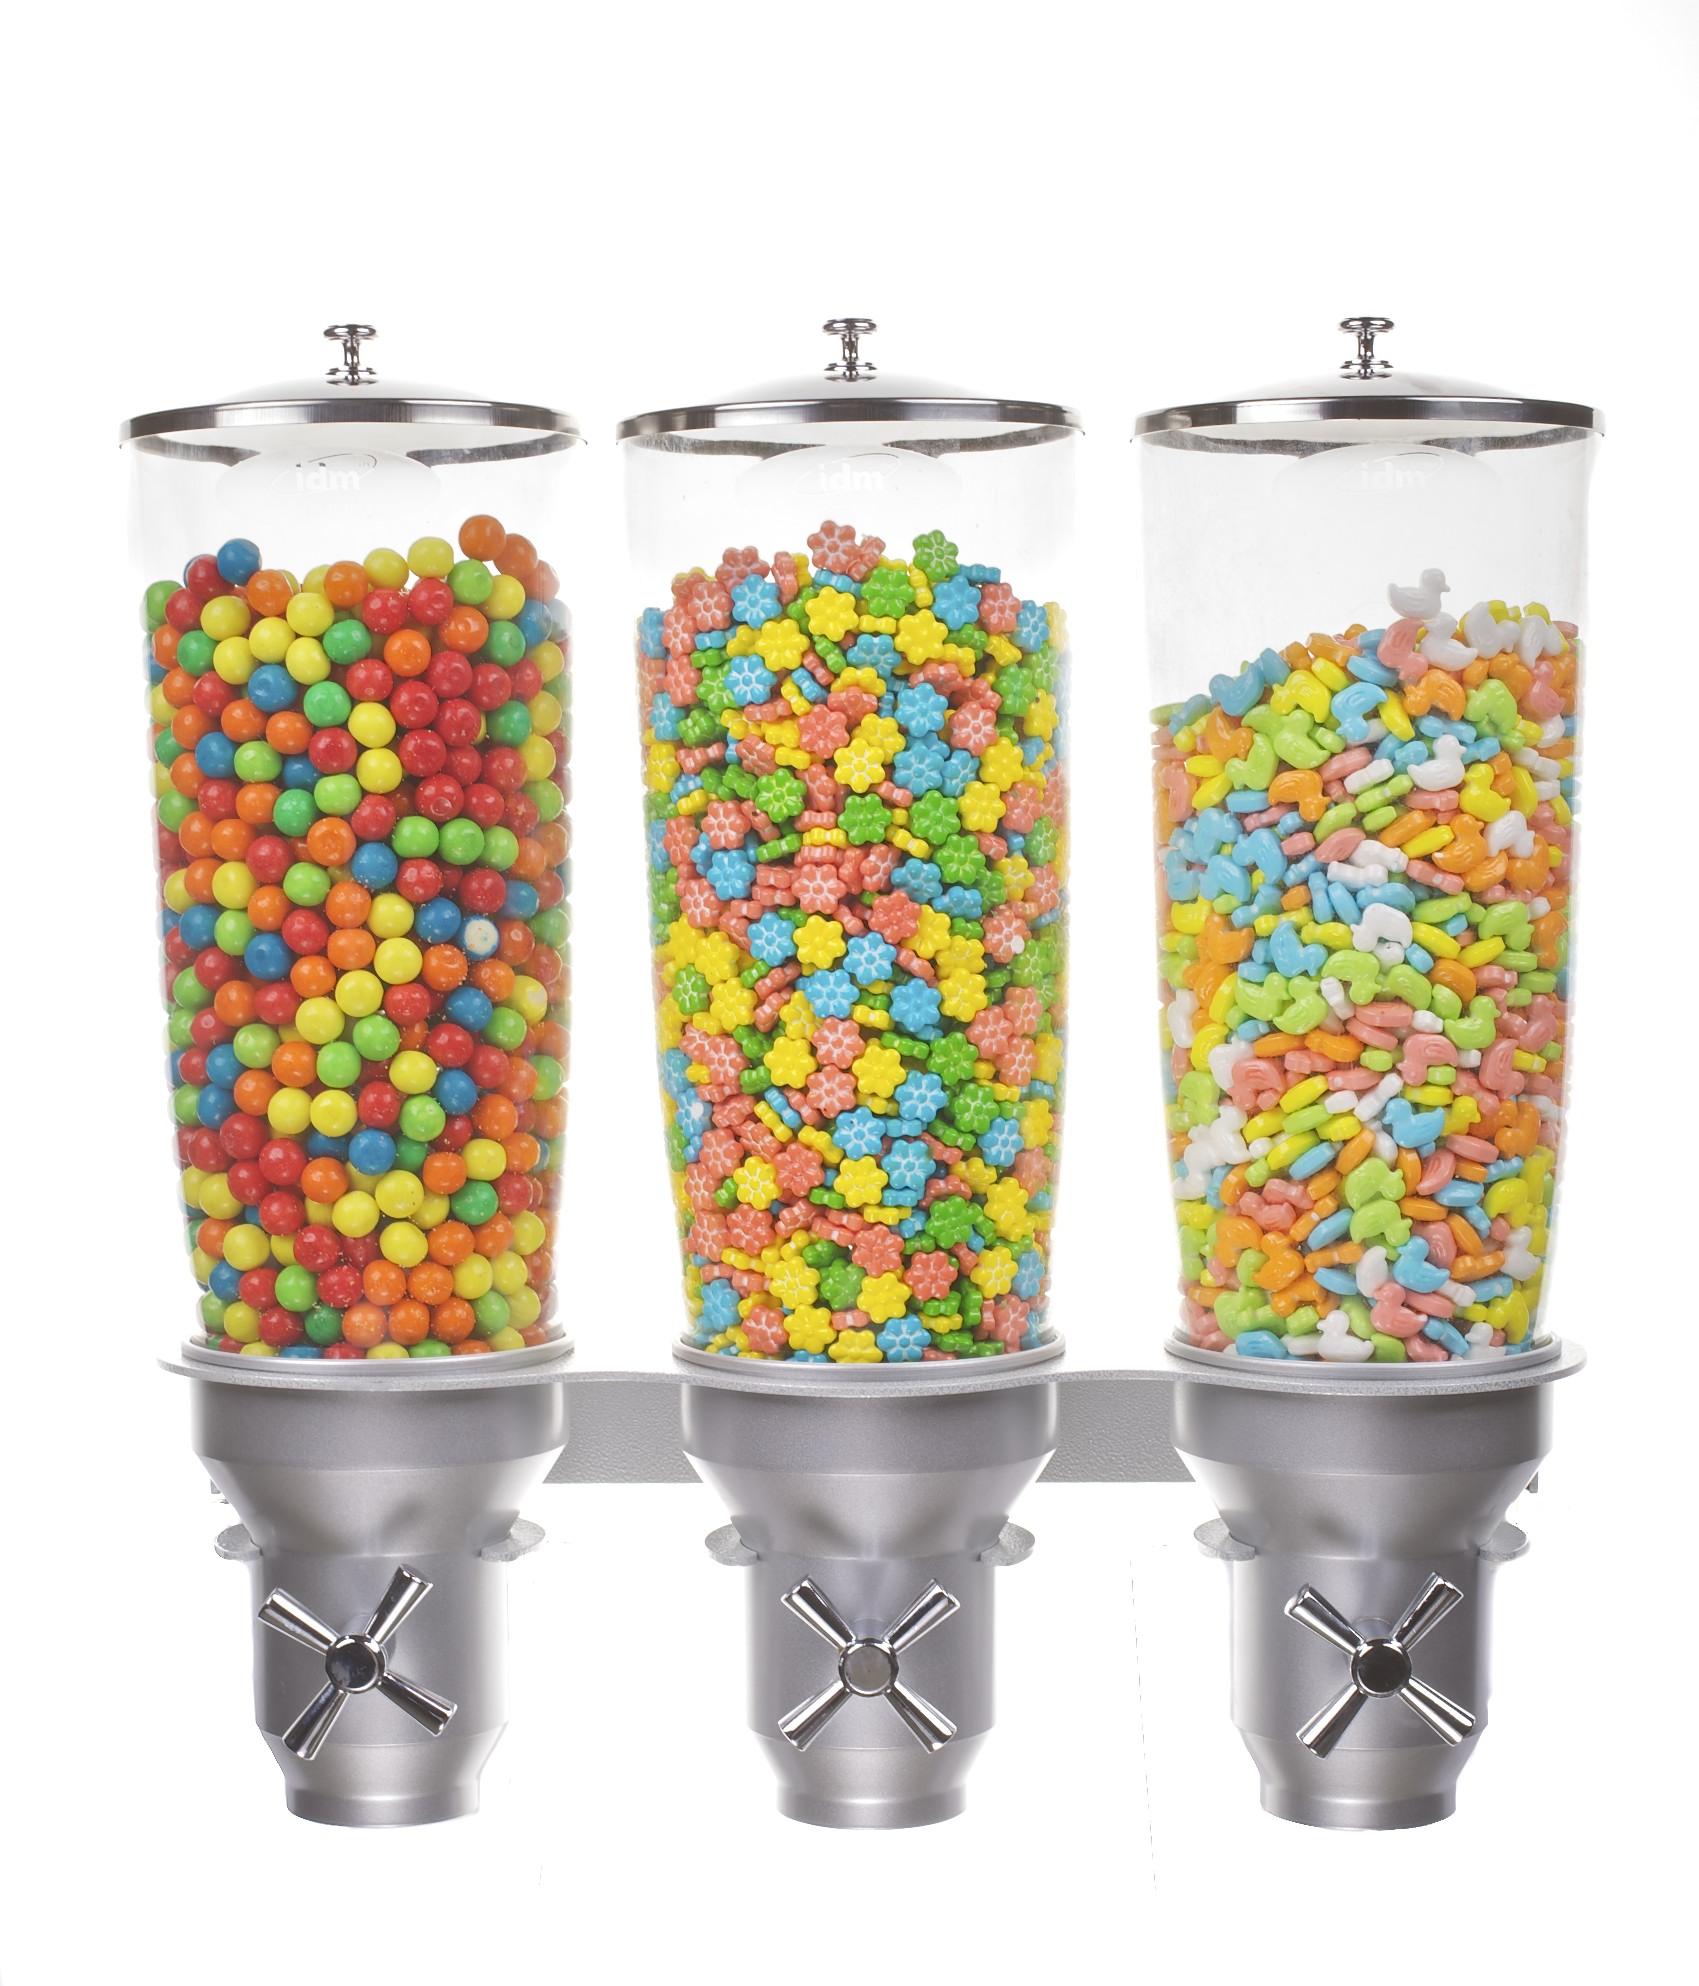 DH30 Candy Dispenser Wallmounted